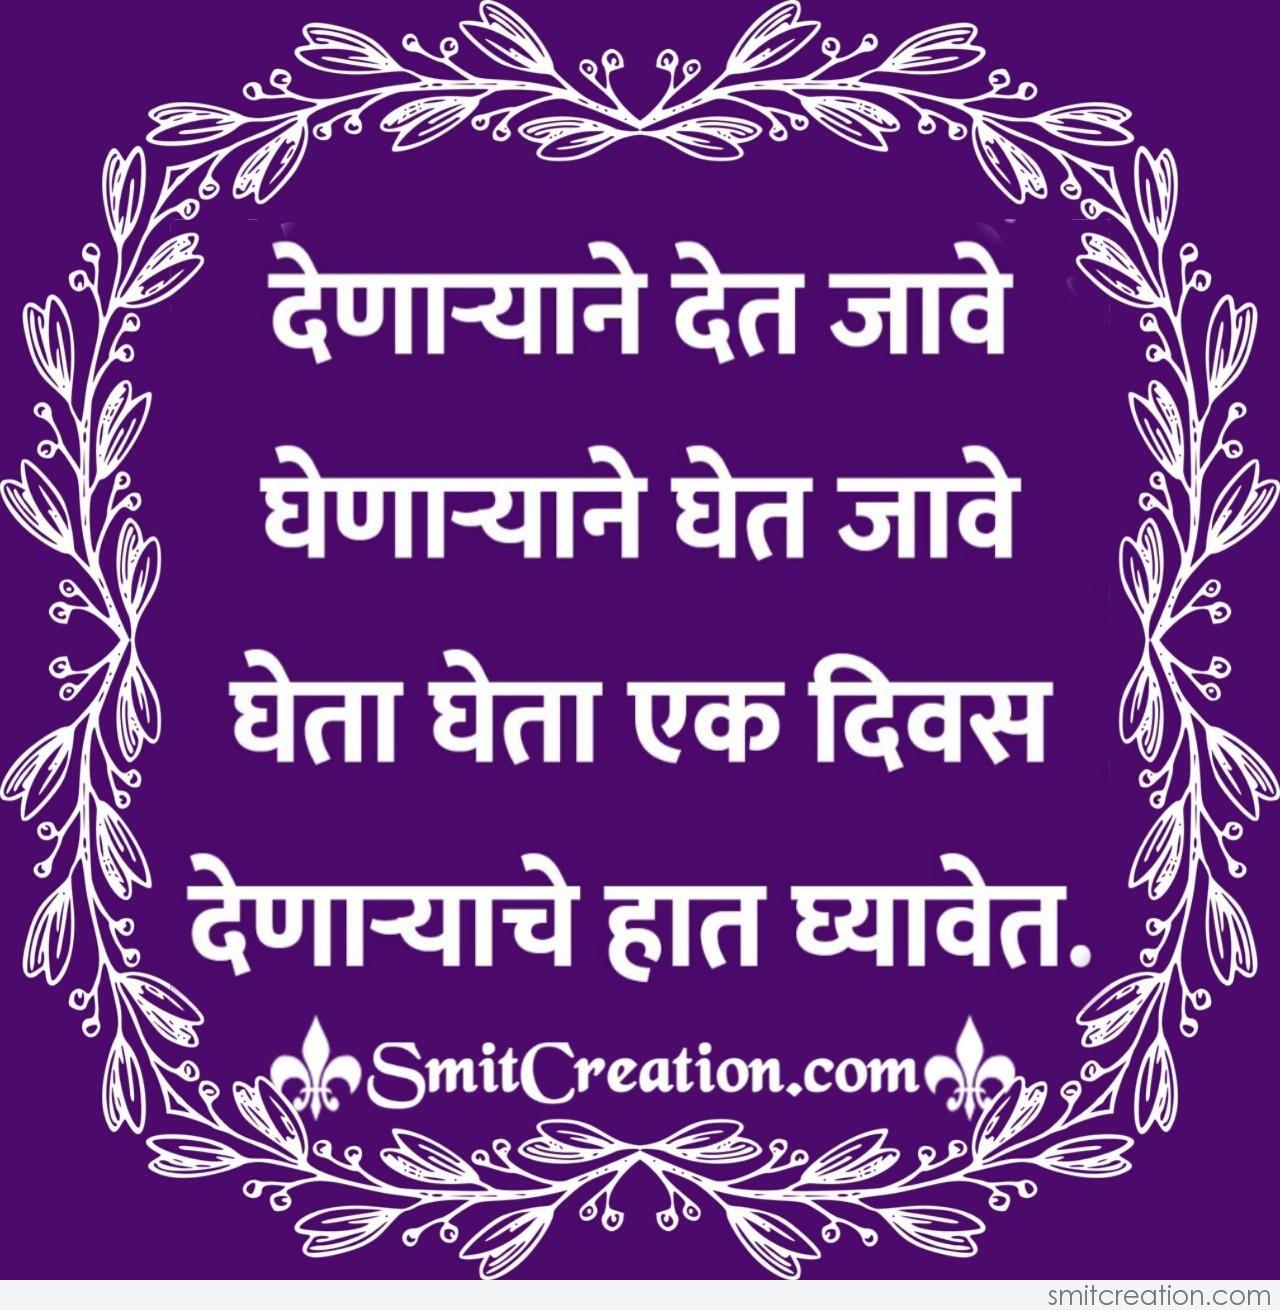 Marathi Shayari (मराठी शायरी) Pictures and